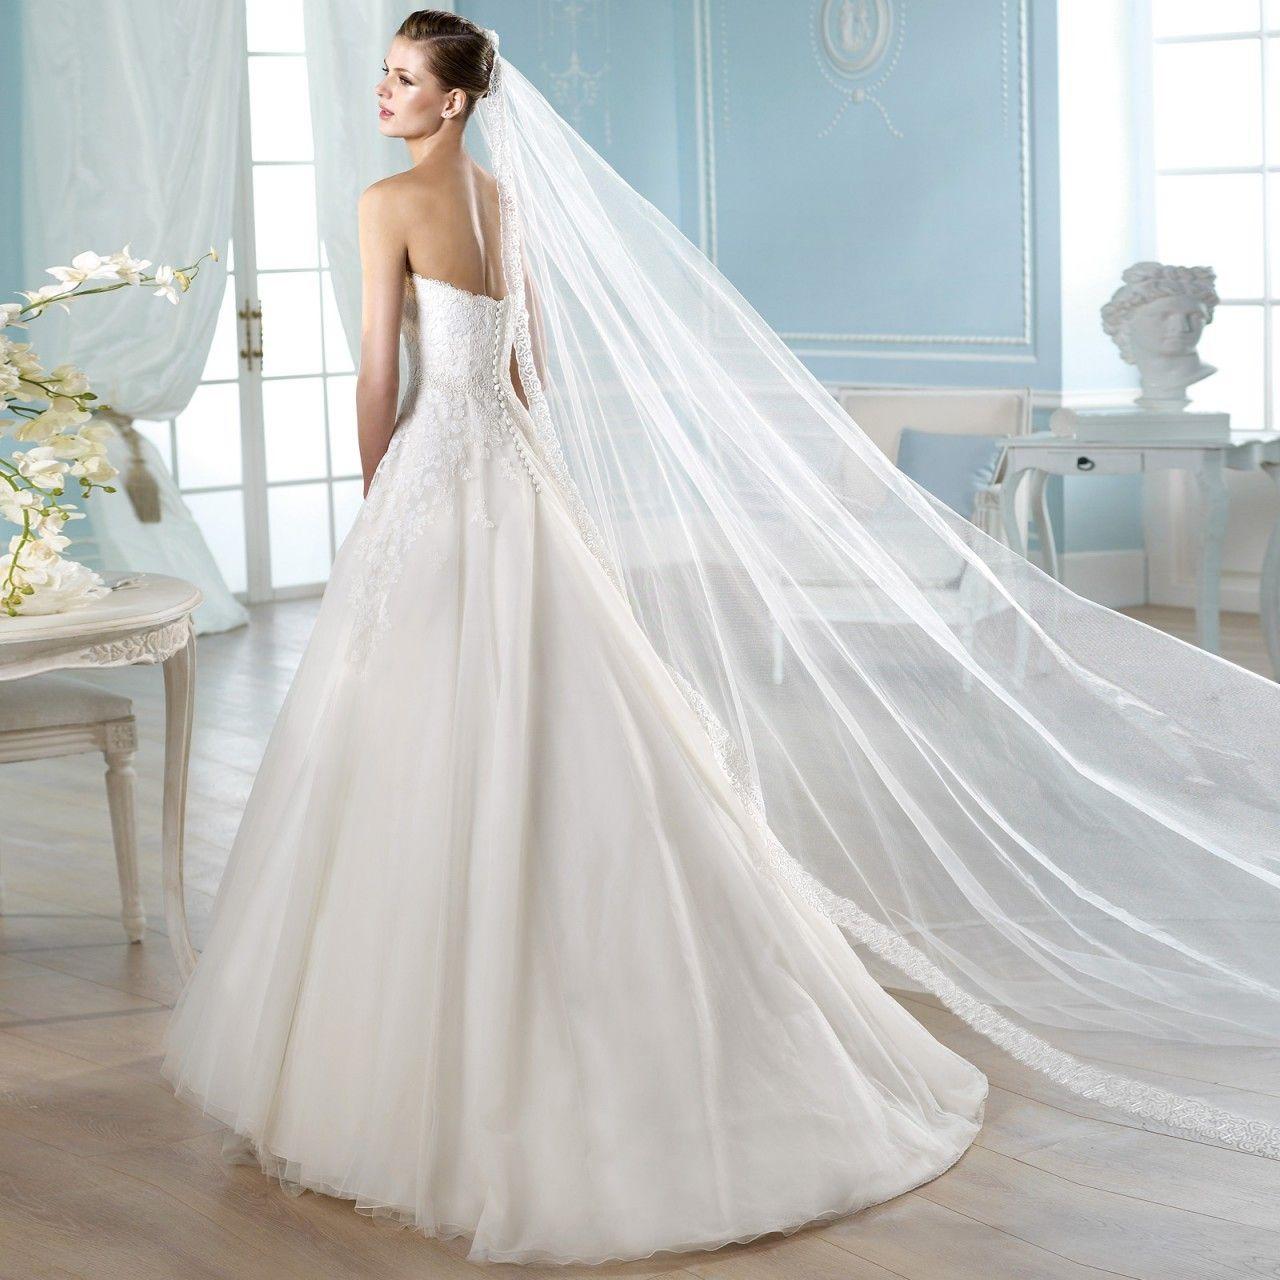 Fashionably Yours Hardoy ALine Lace Wedding Dress by